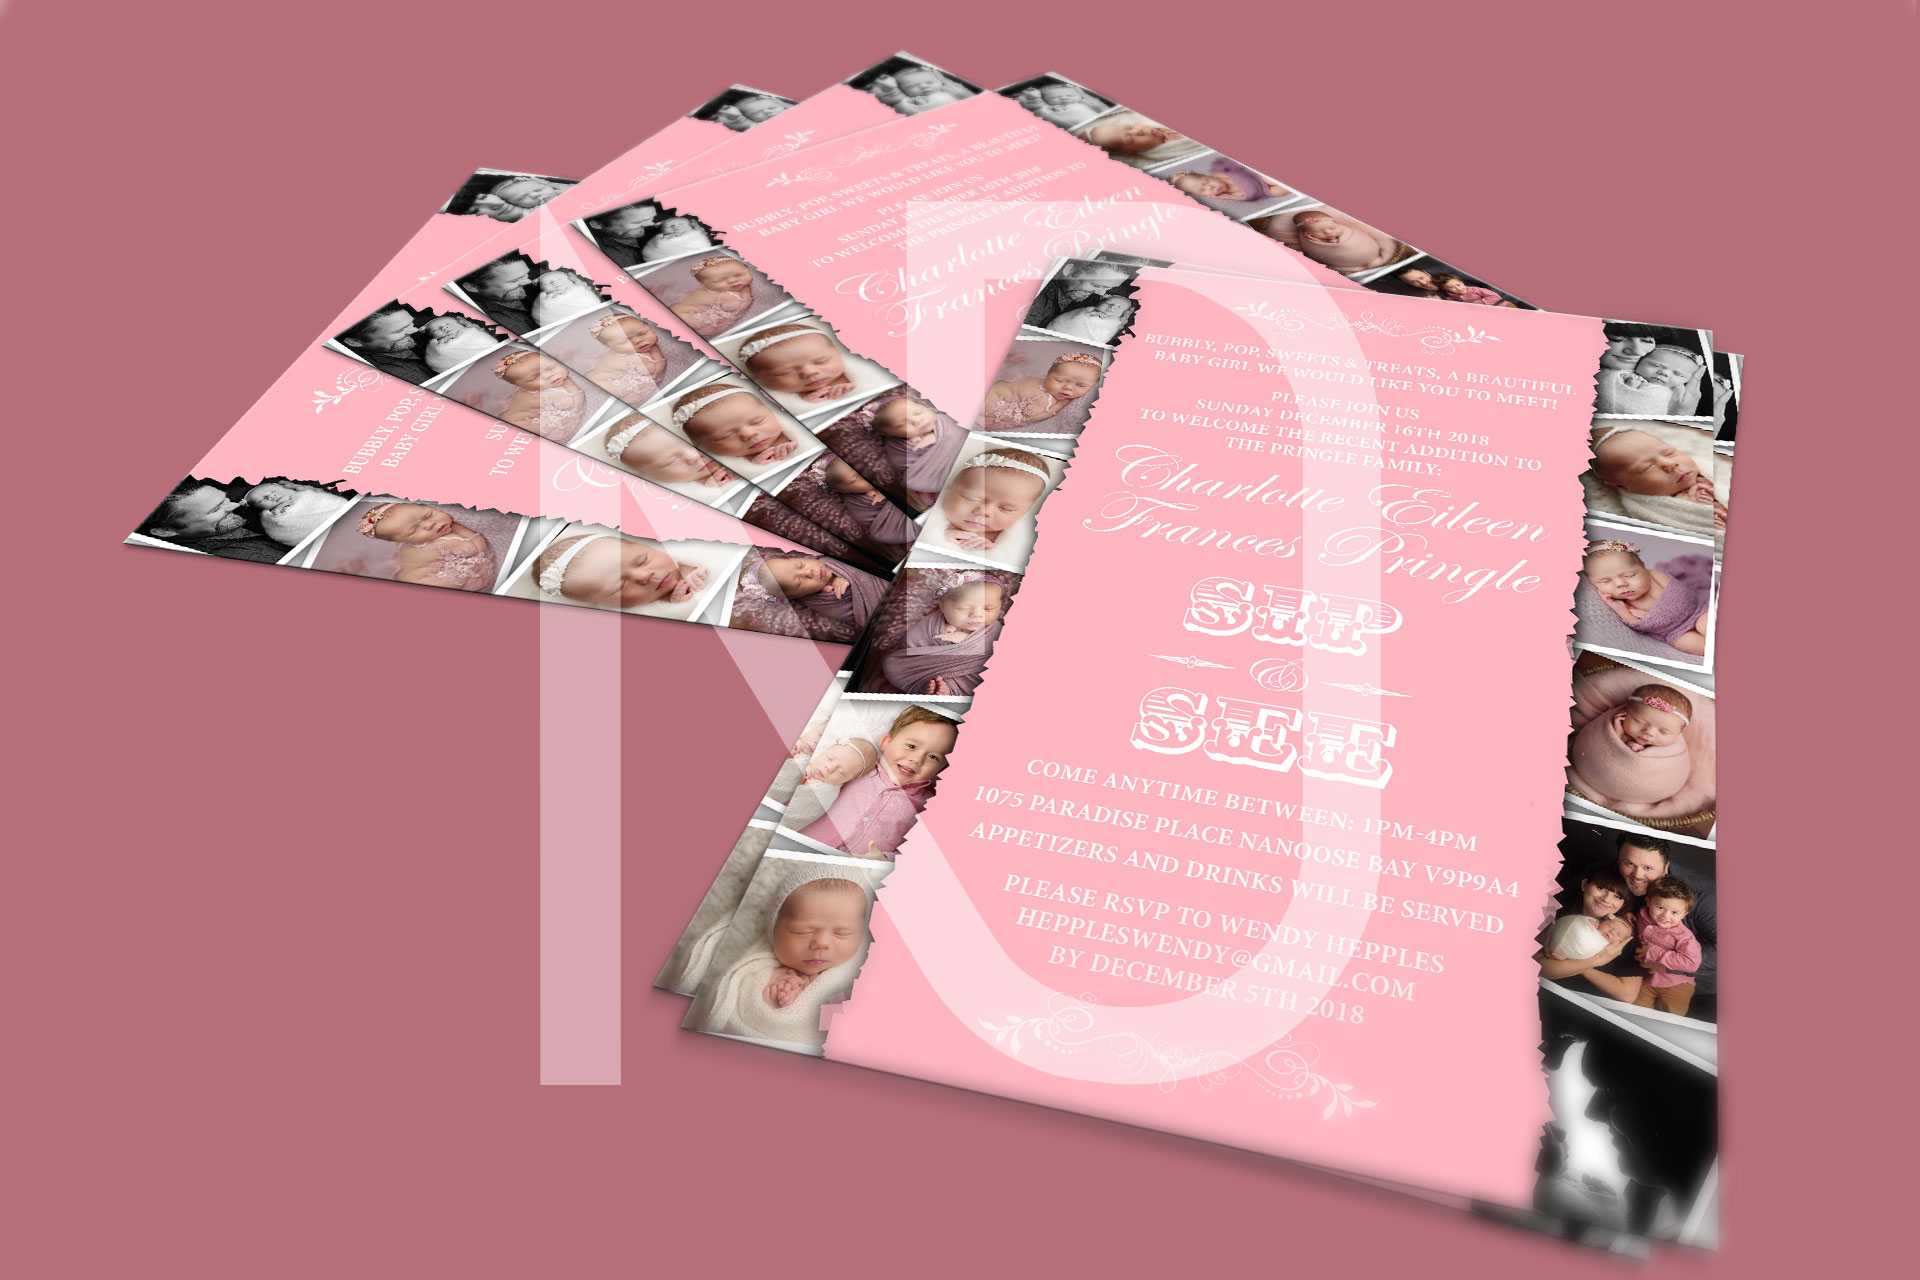 Amazing Invitation/Flyer Design for Wedding/Event/Party/Holidays/Seasons